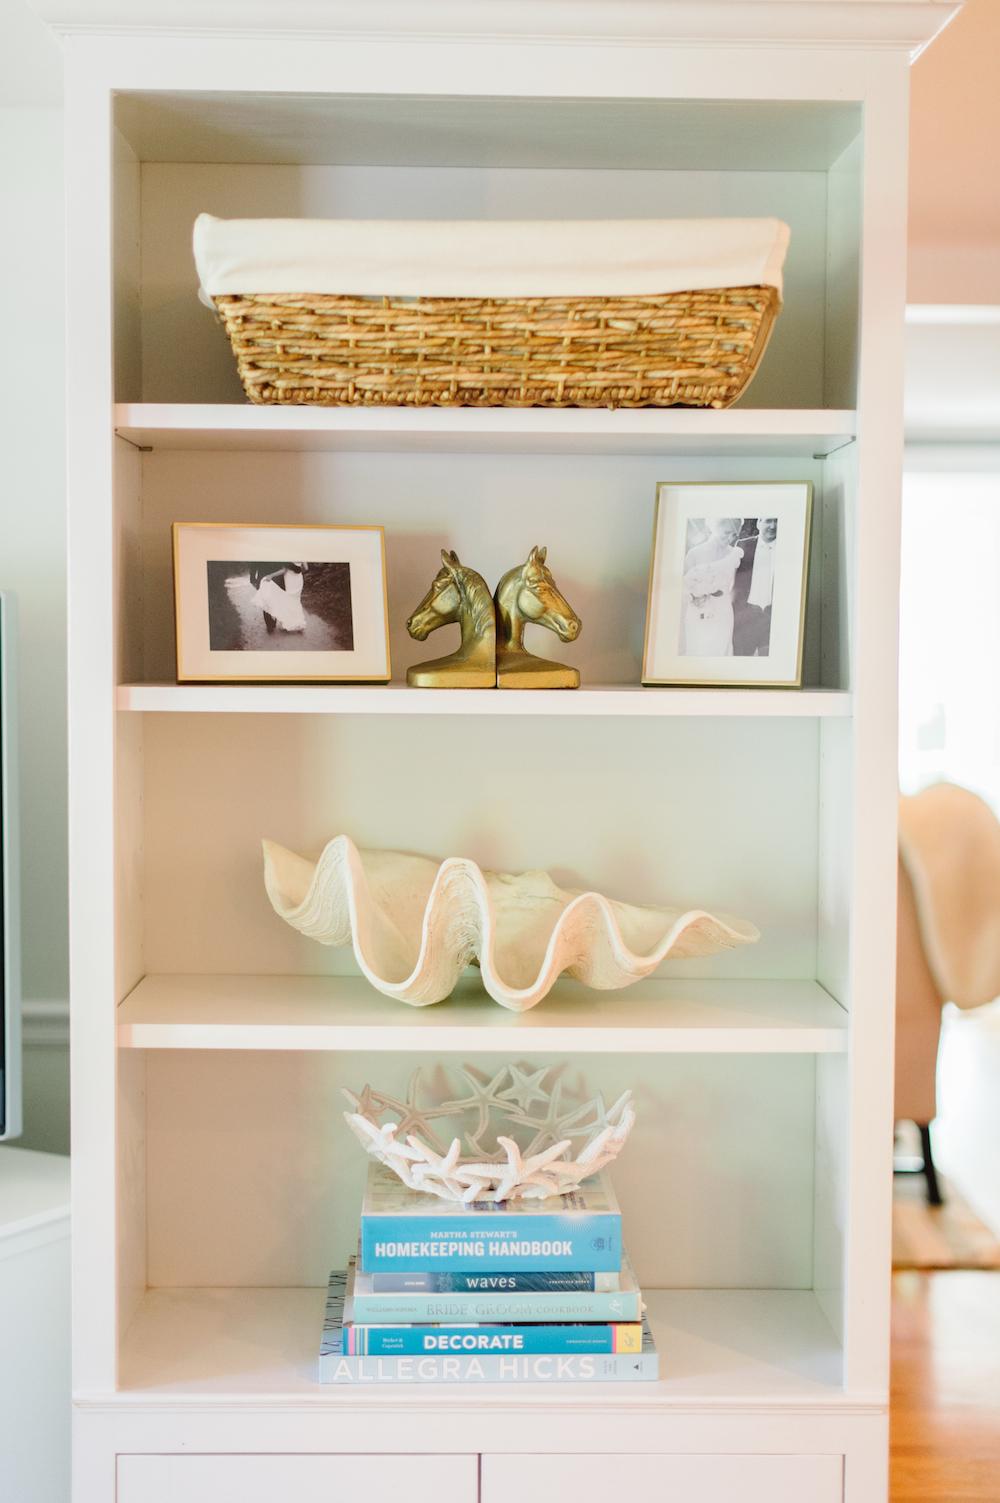 rhode-island-interior-design-photographer-leila-brewster-photography-284.jpg